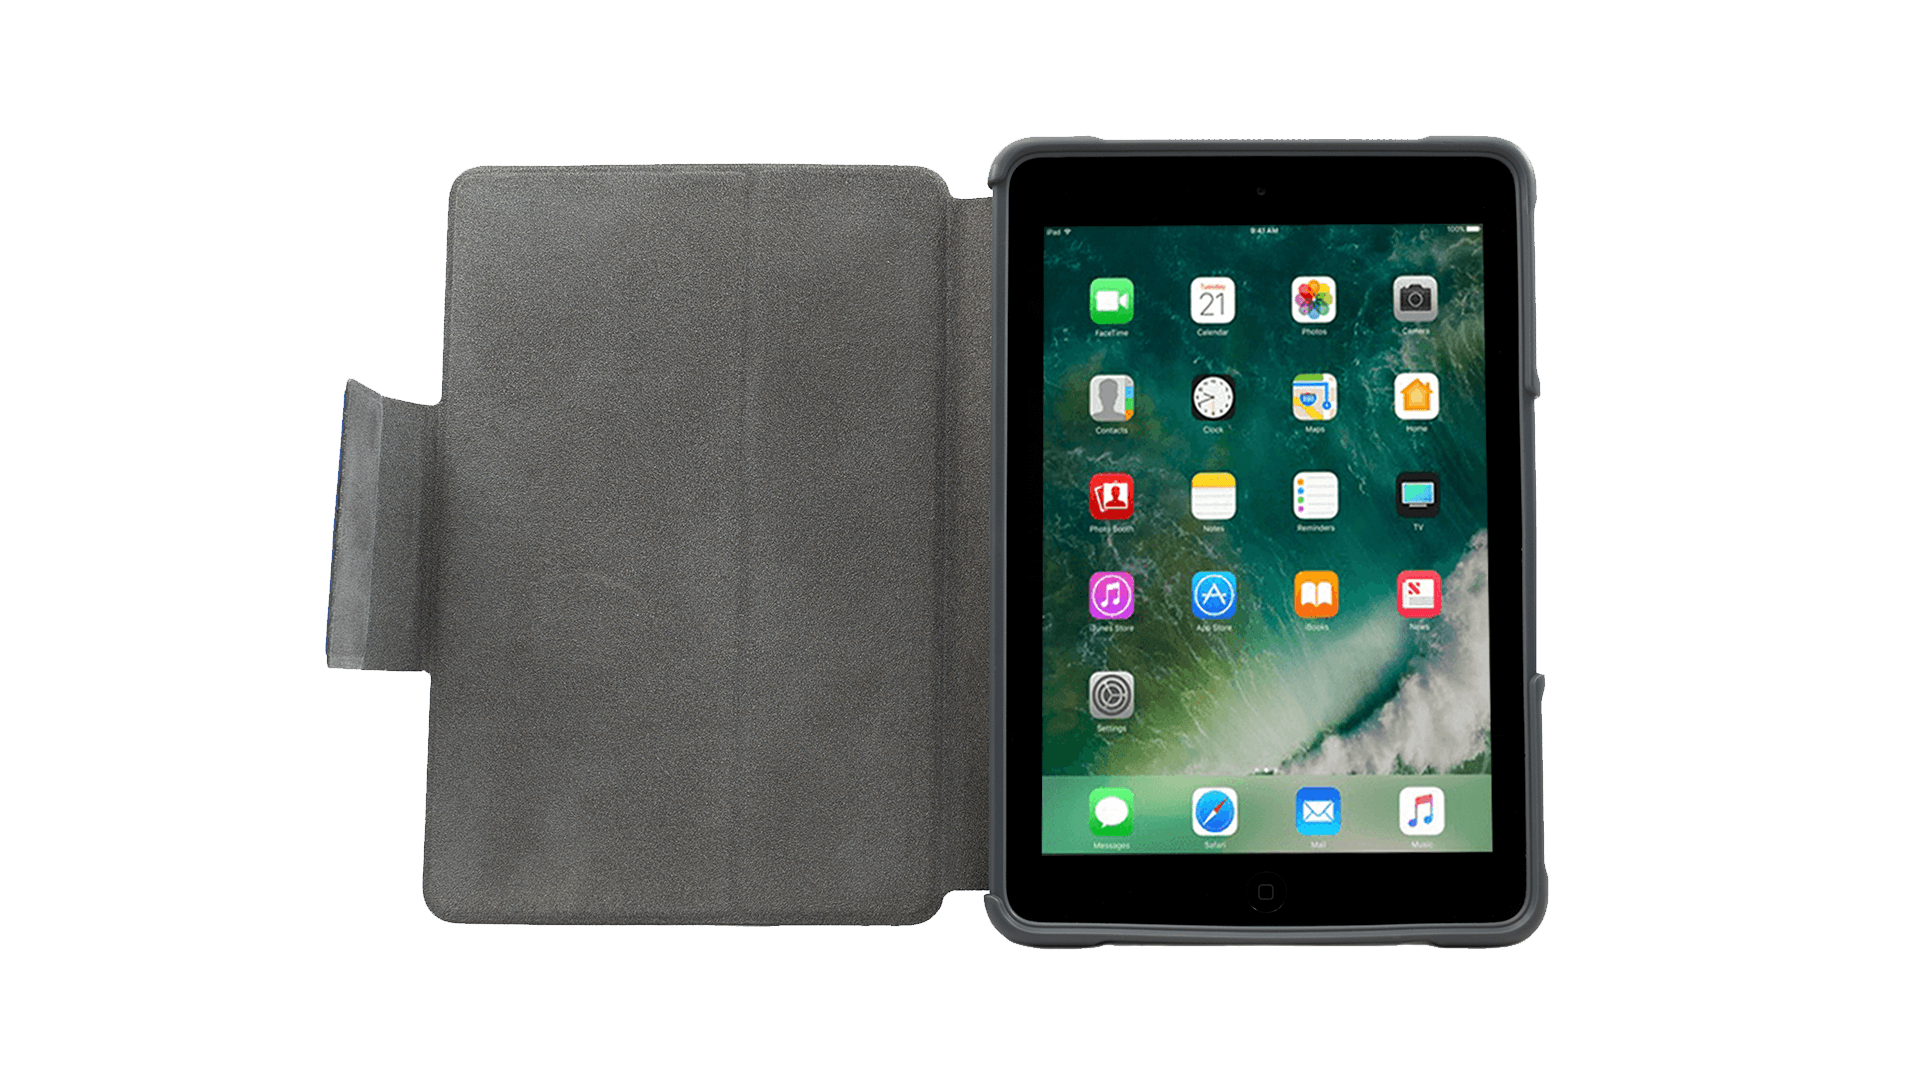 apple ipad mini 4 wifi 4g mieten ipadsmieten. Black Bedroom Furniture Sets. Home Design Ideas